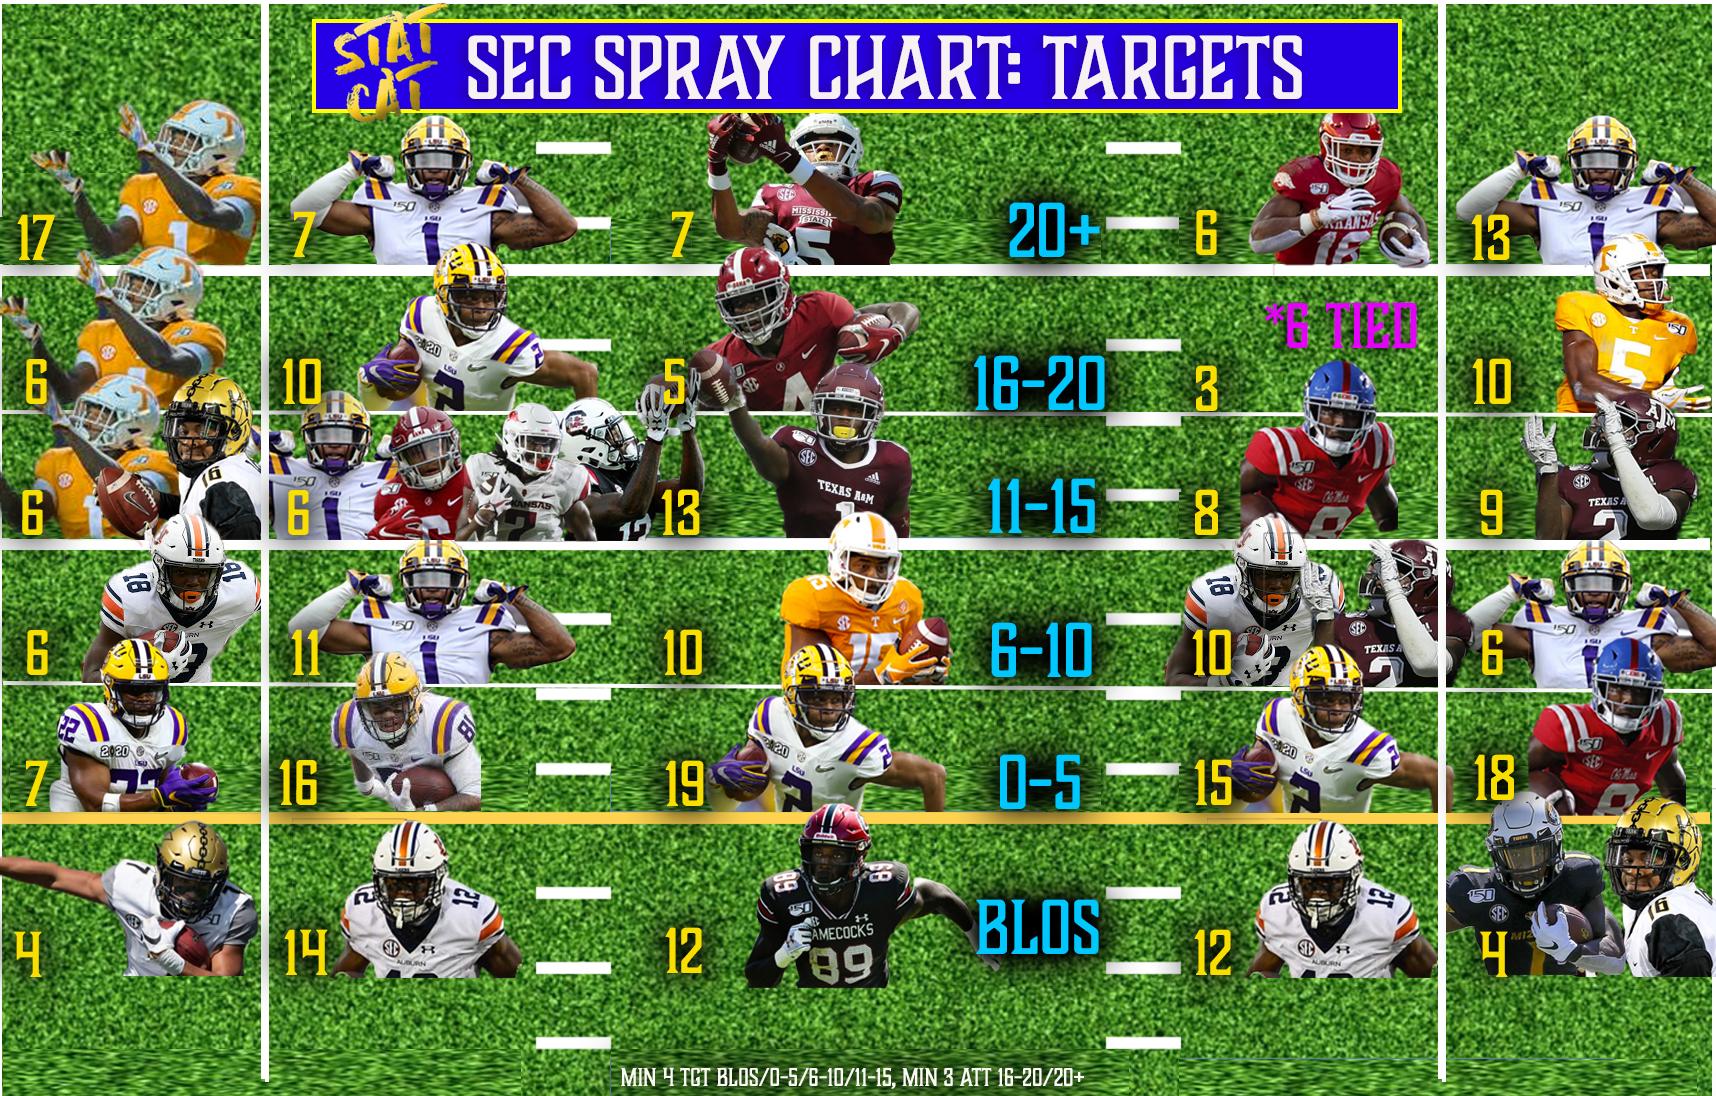 2019 Spray Chart: Pass Targets